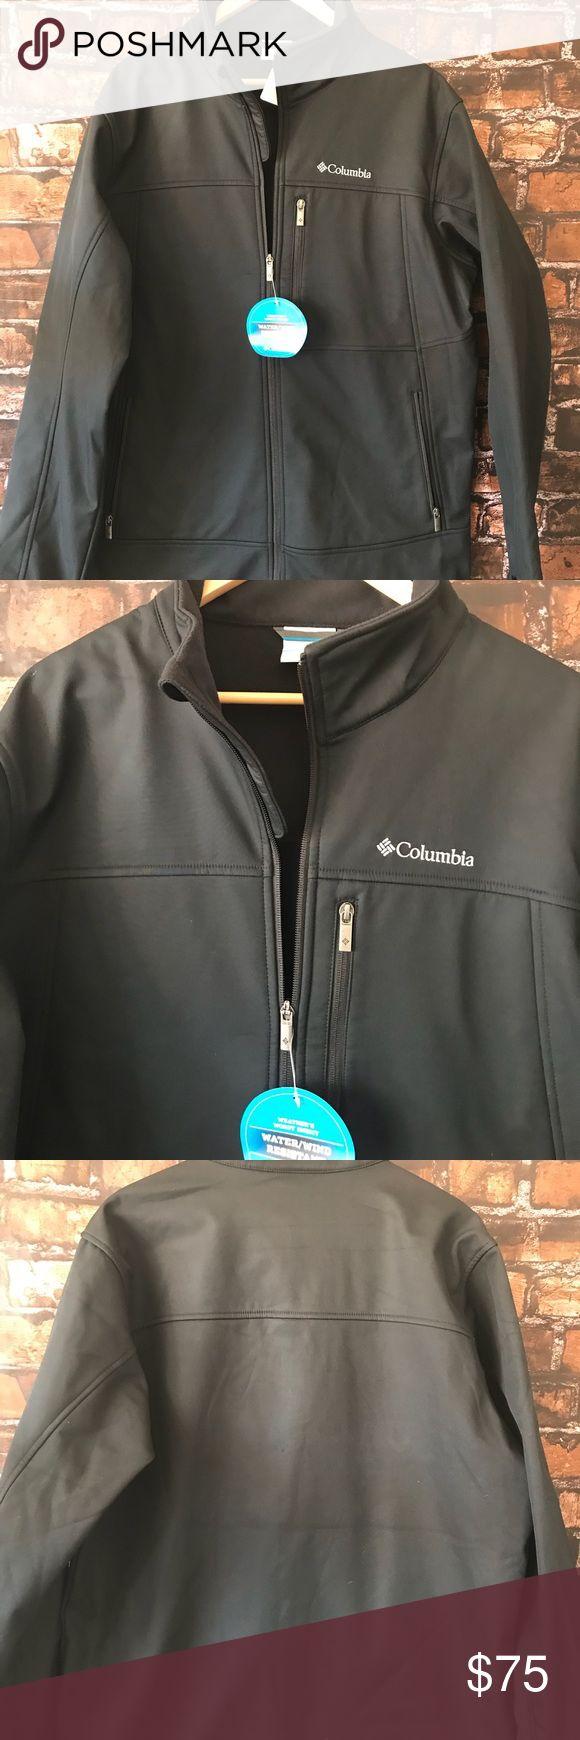 🆕 Columbia Big & Tall Men's Jacket! COLUMBIA Men's Jacket Coat SOFTSHELL Big And Tall Large LT Water Wind Resistant Columbia Jackets & Coats Performance Jackets